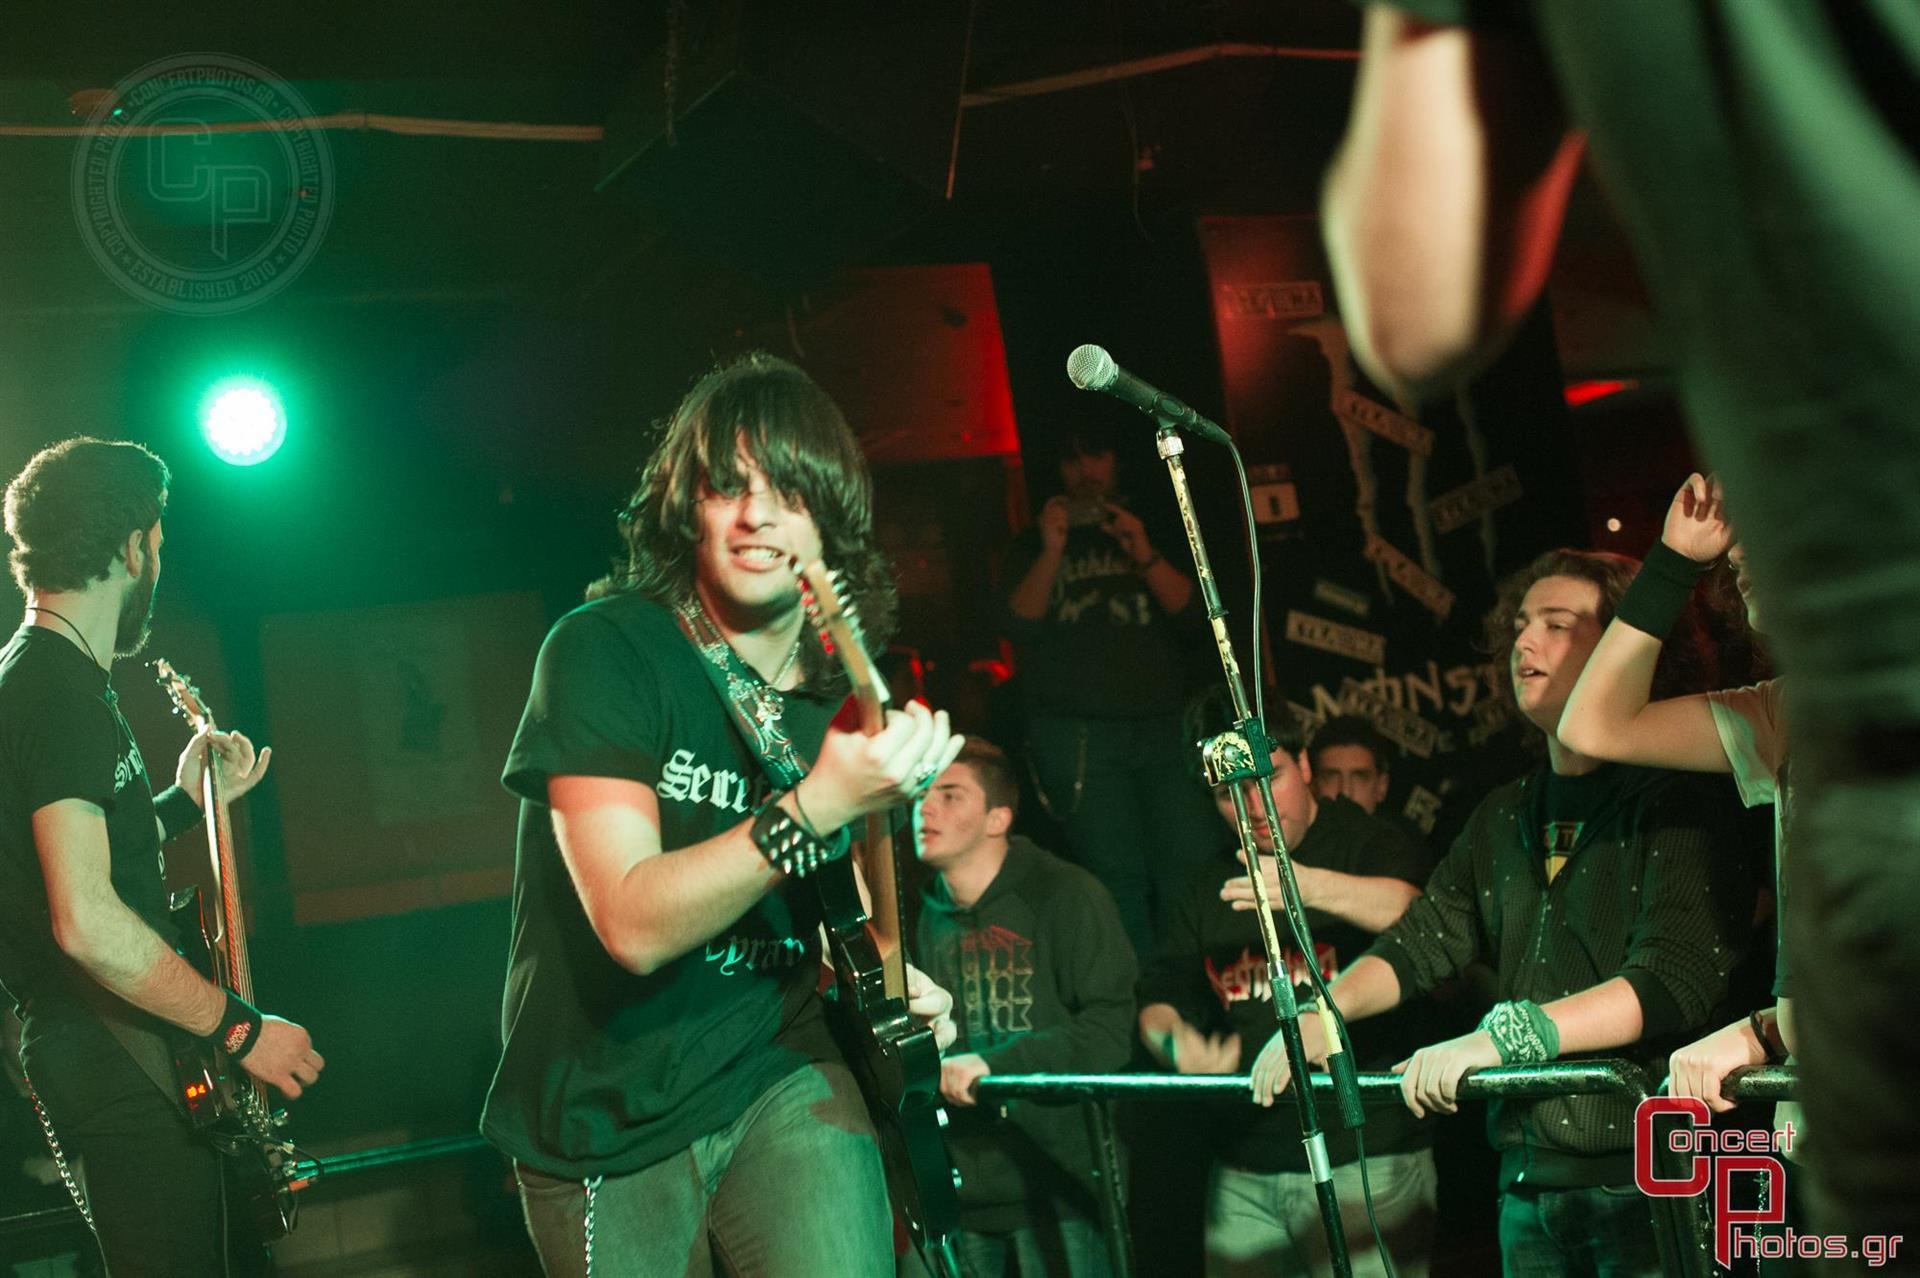 Battle Of The Bands Athens - Leg 3- photographer:  - ConcertPhotos - 20150104_2338_47